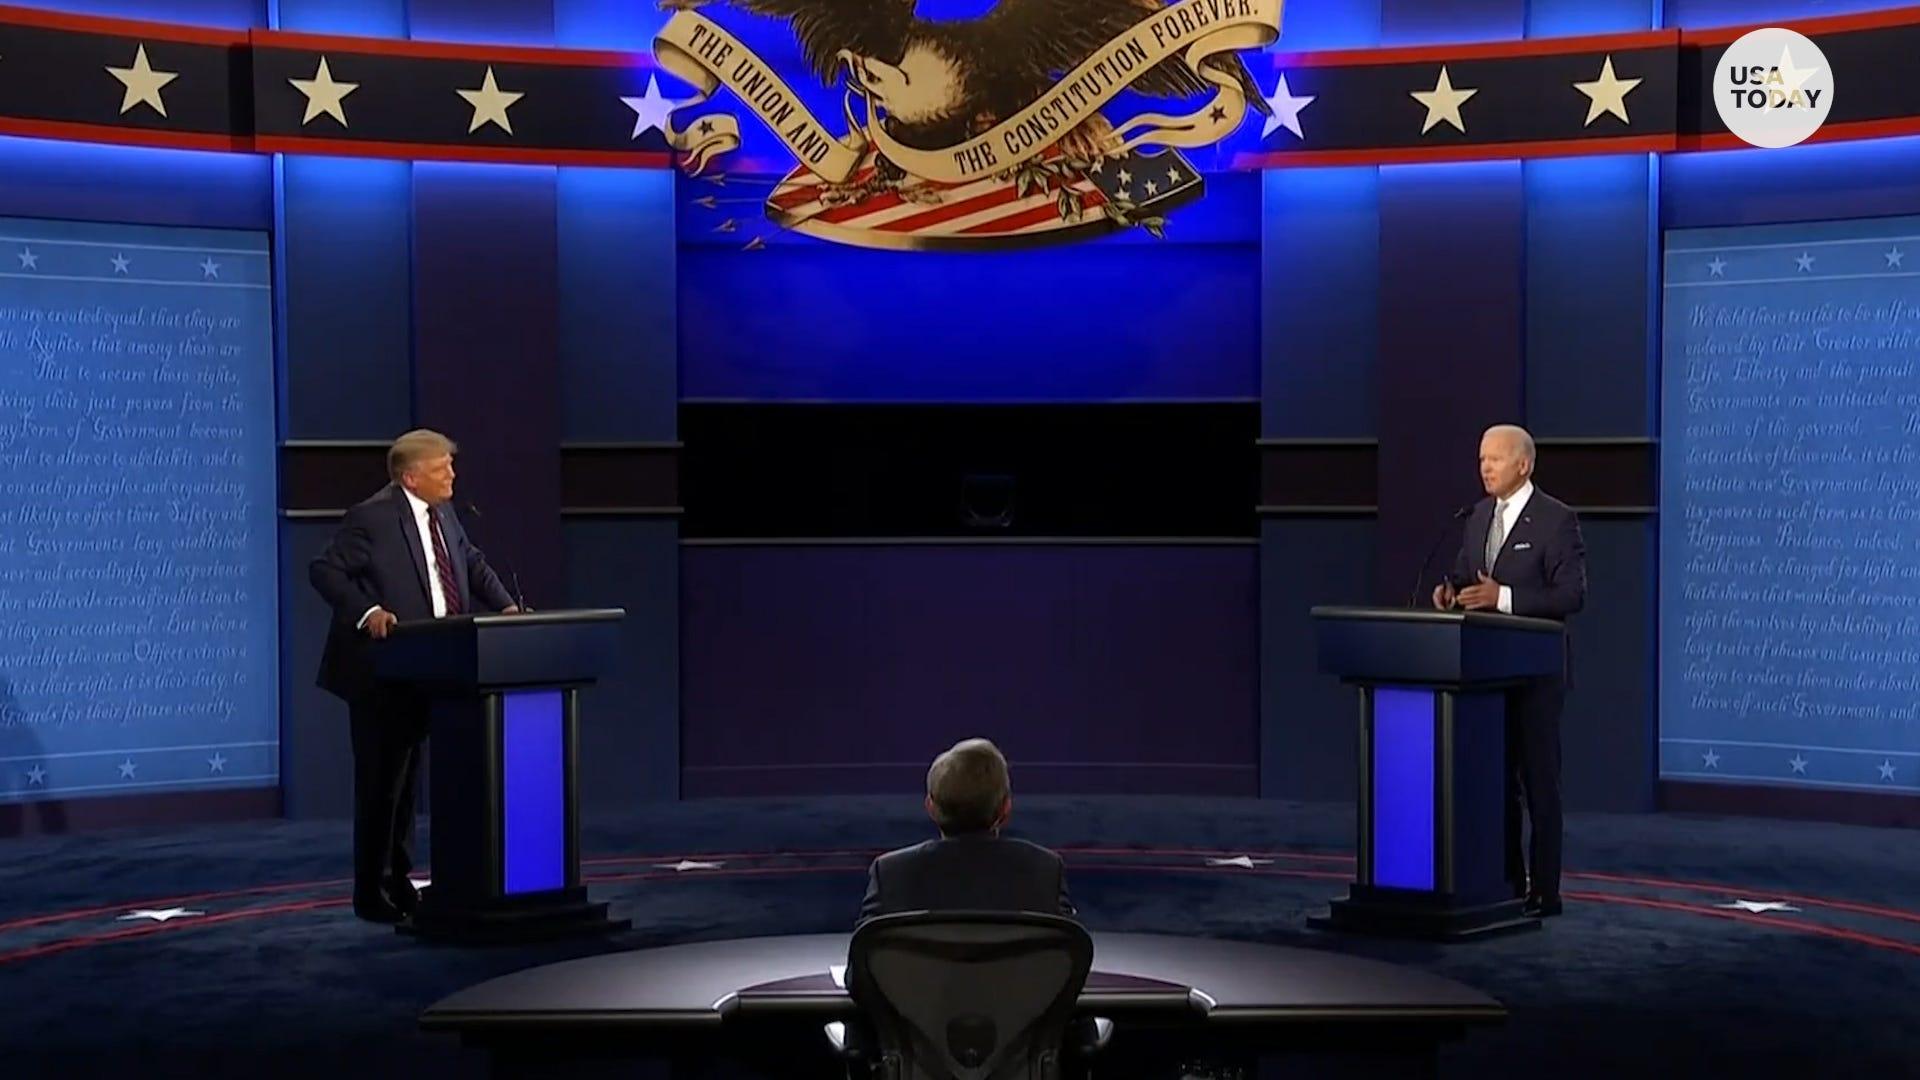 Pres. Trump and former Vice Pres. Biden spar over white supremacy, ANTIFA at first debate